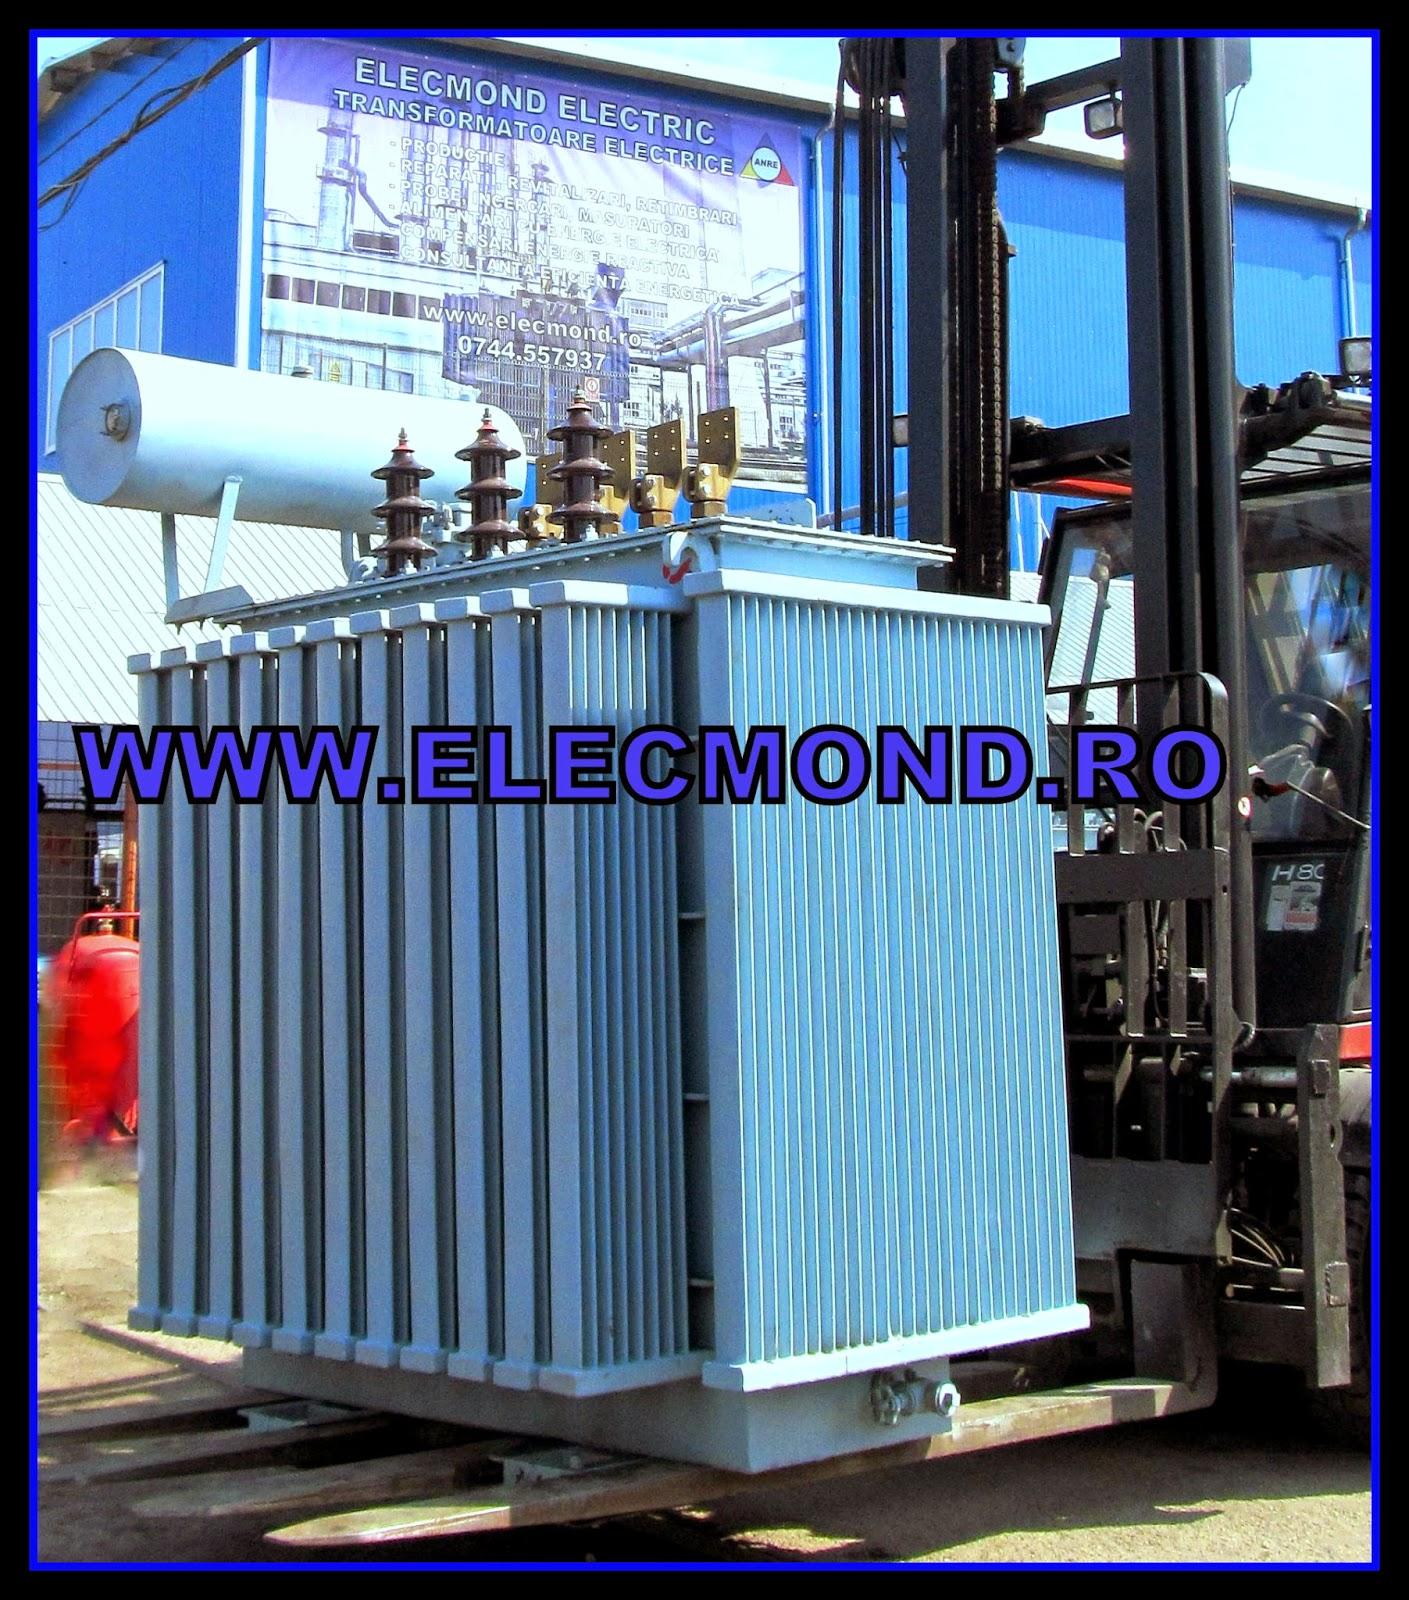 transformatoare, #transformator , elecmond, transformator 2 MVA , transformatoare 2000 kVA , 20/0,4kV , transformatoare Craiova , trafo , 20/6 kV,